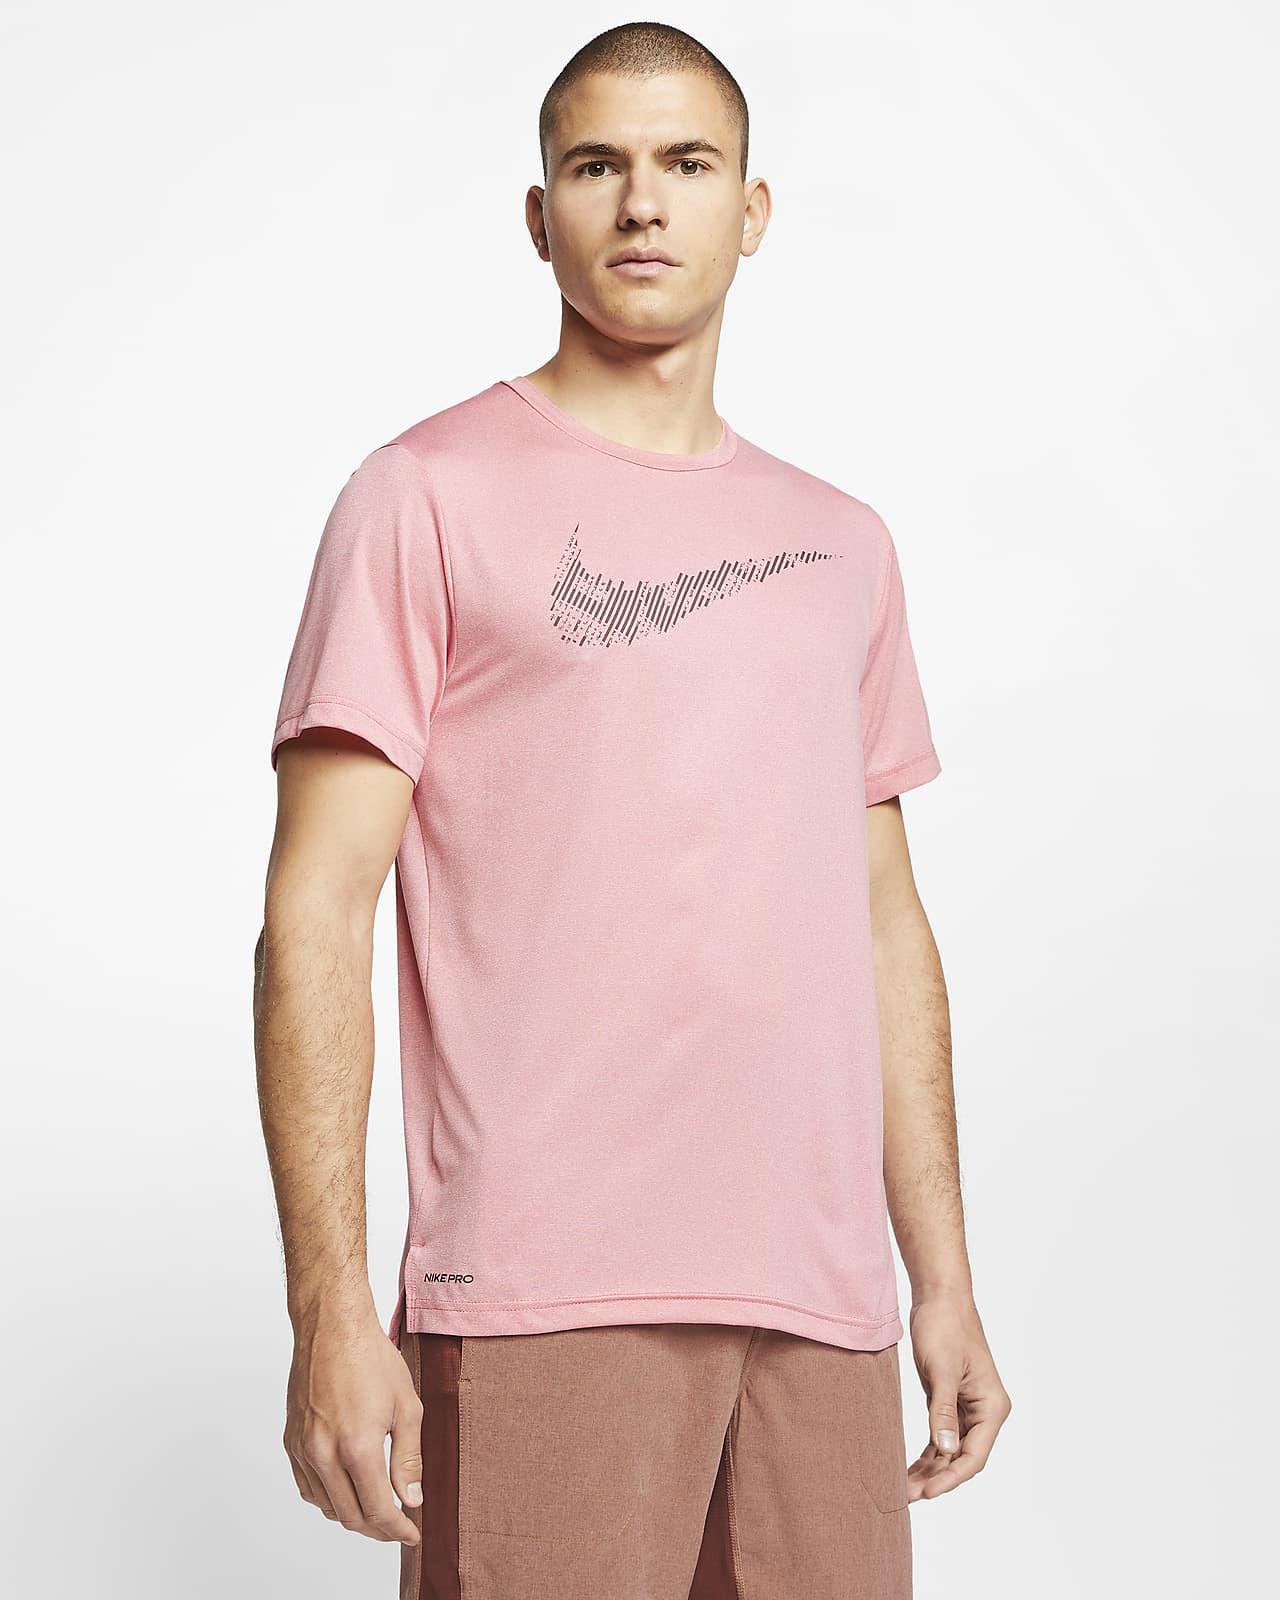 Nike Dri-FIT Men's Short-Sleeve Graphic Training Top